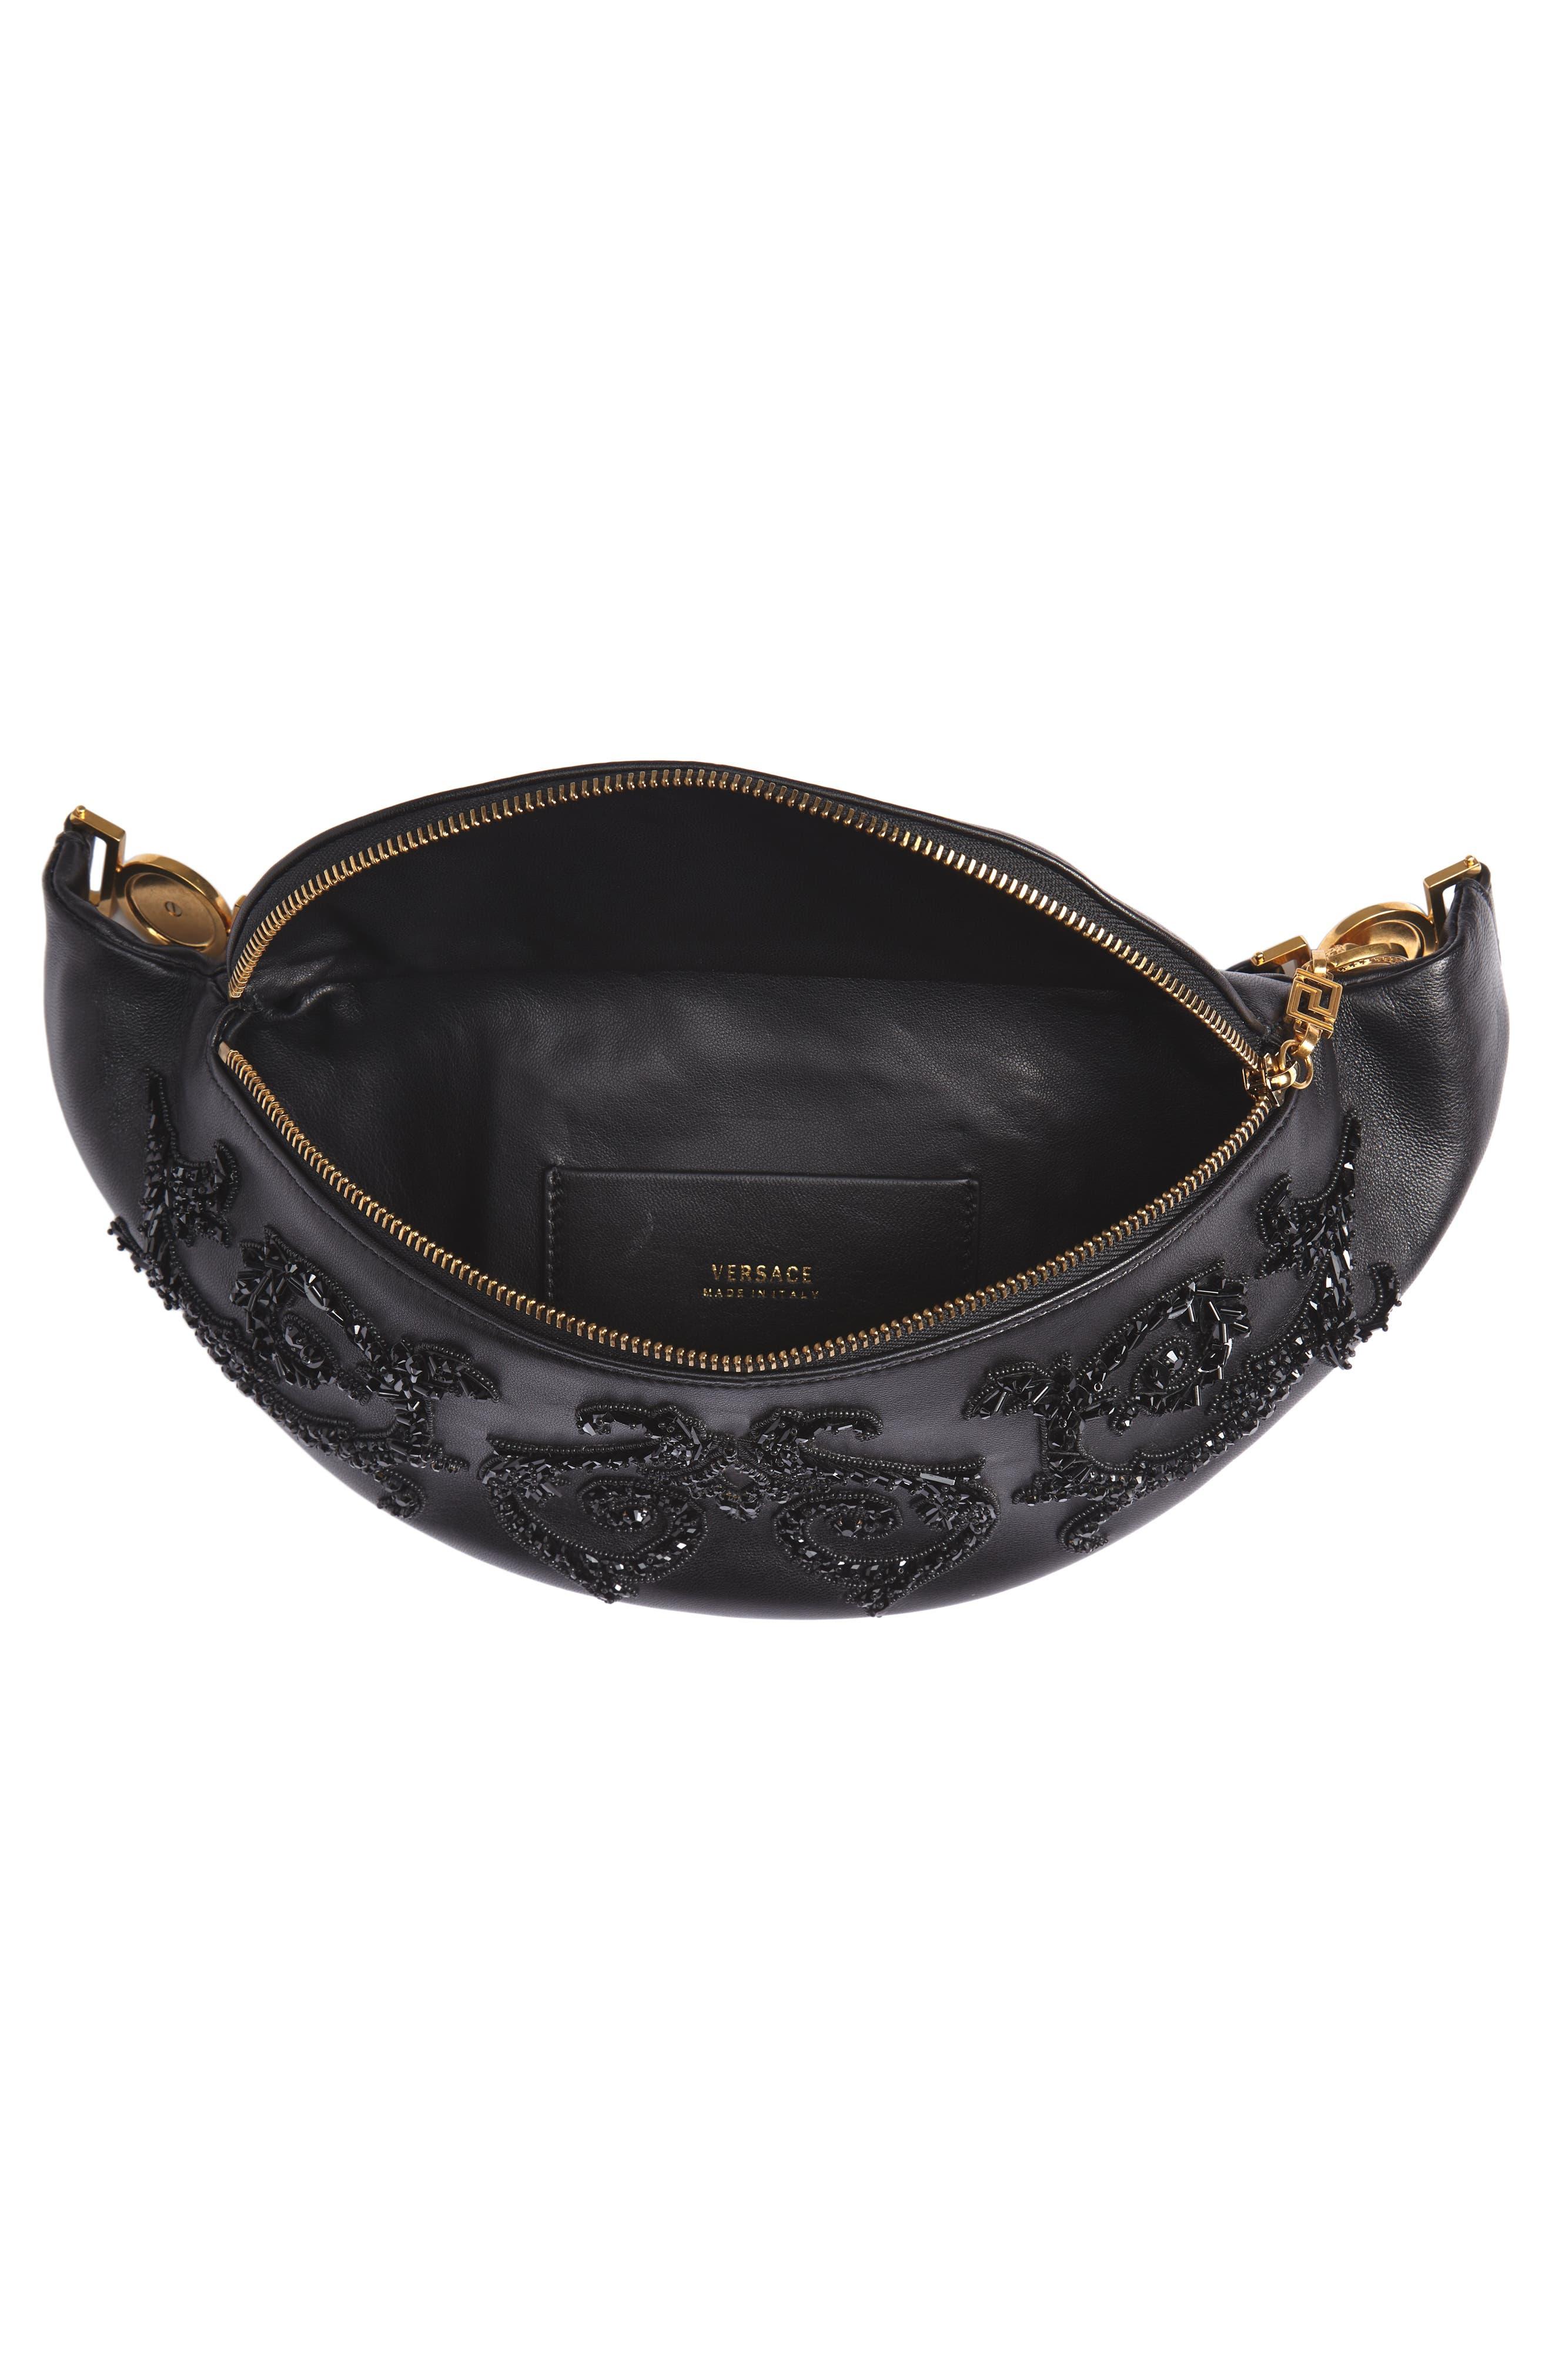 VERSACE COLLECTION, Versace Crystal Embellished Leather Belt Bag, Alternate thumbnail 5, color, NERO